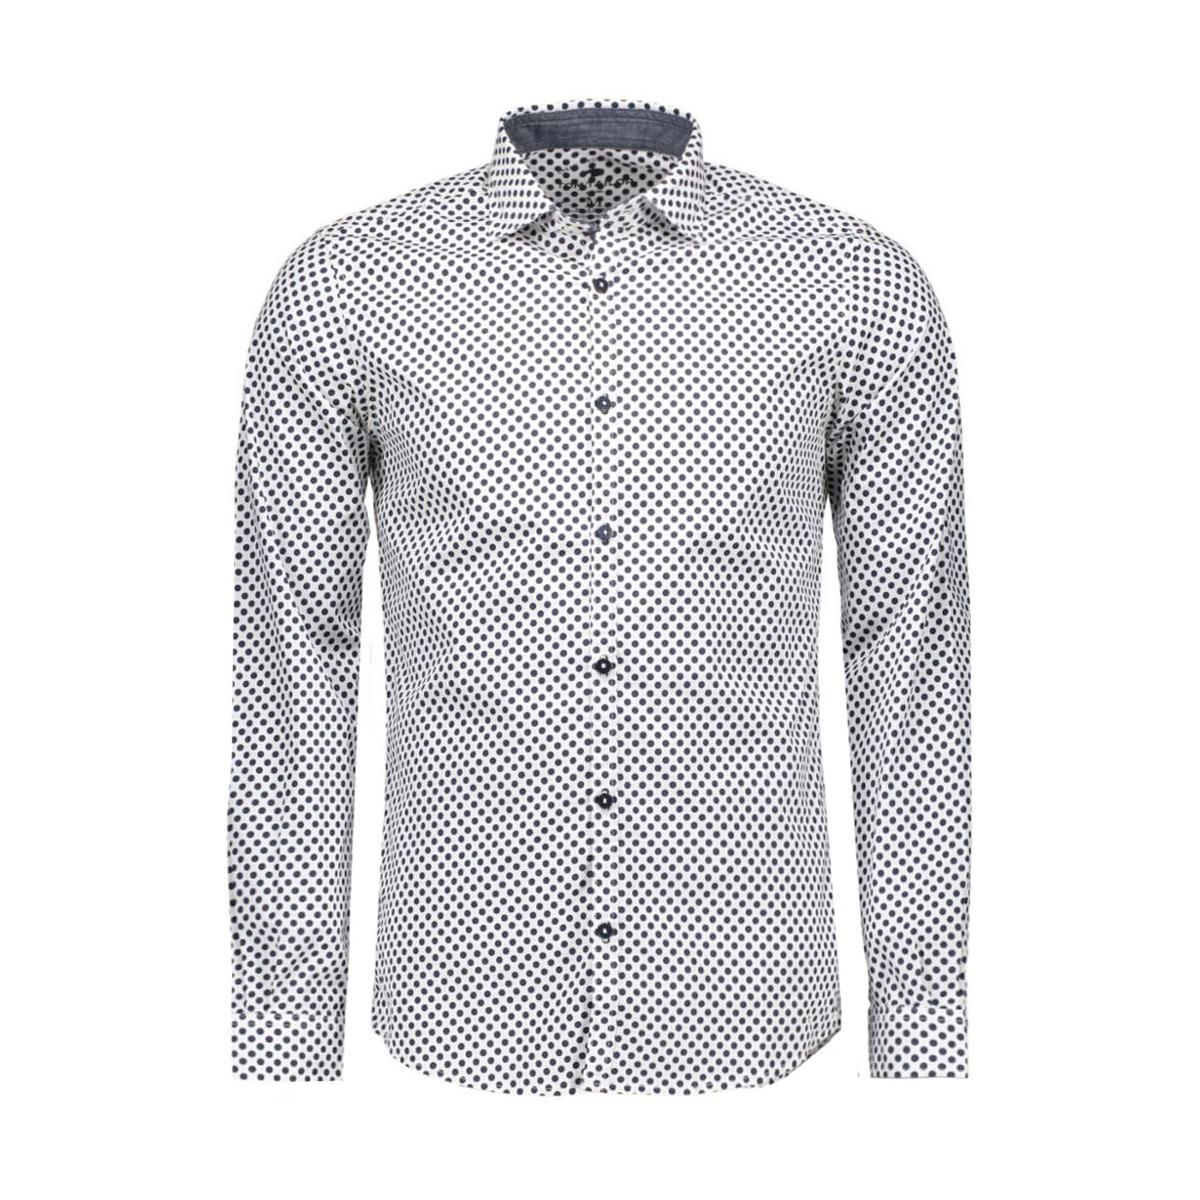 2032268.01.10 tom tailor overhemd 2000